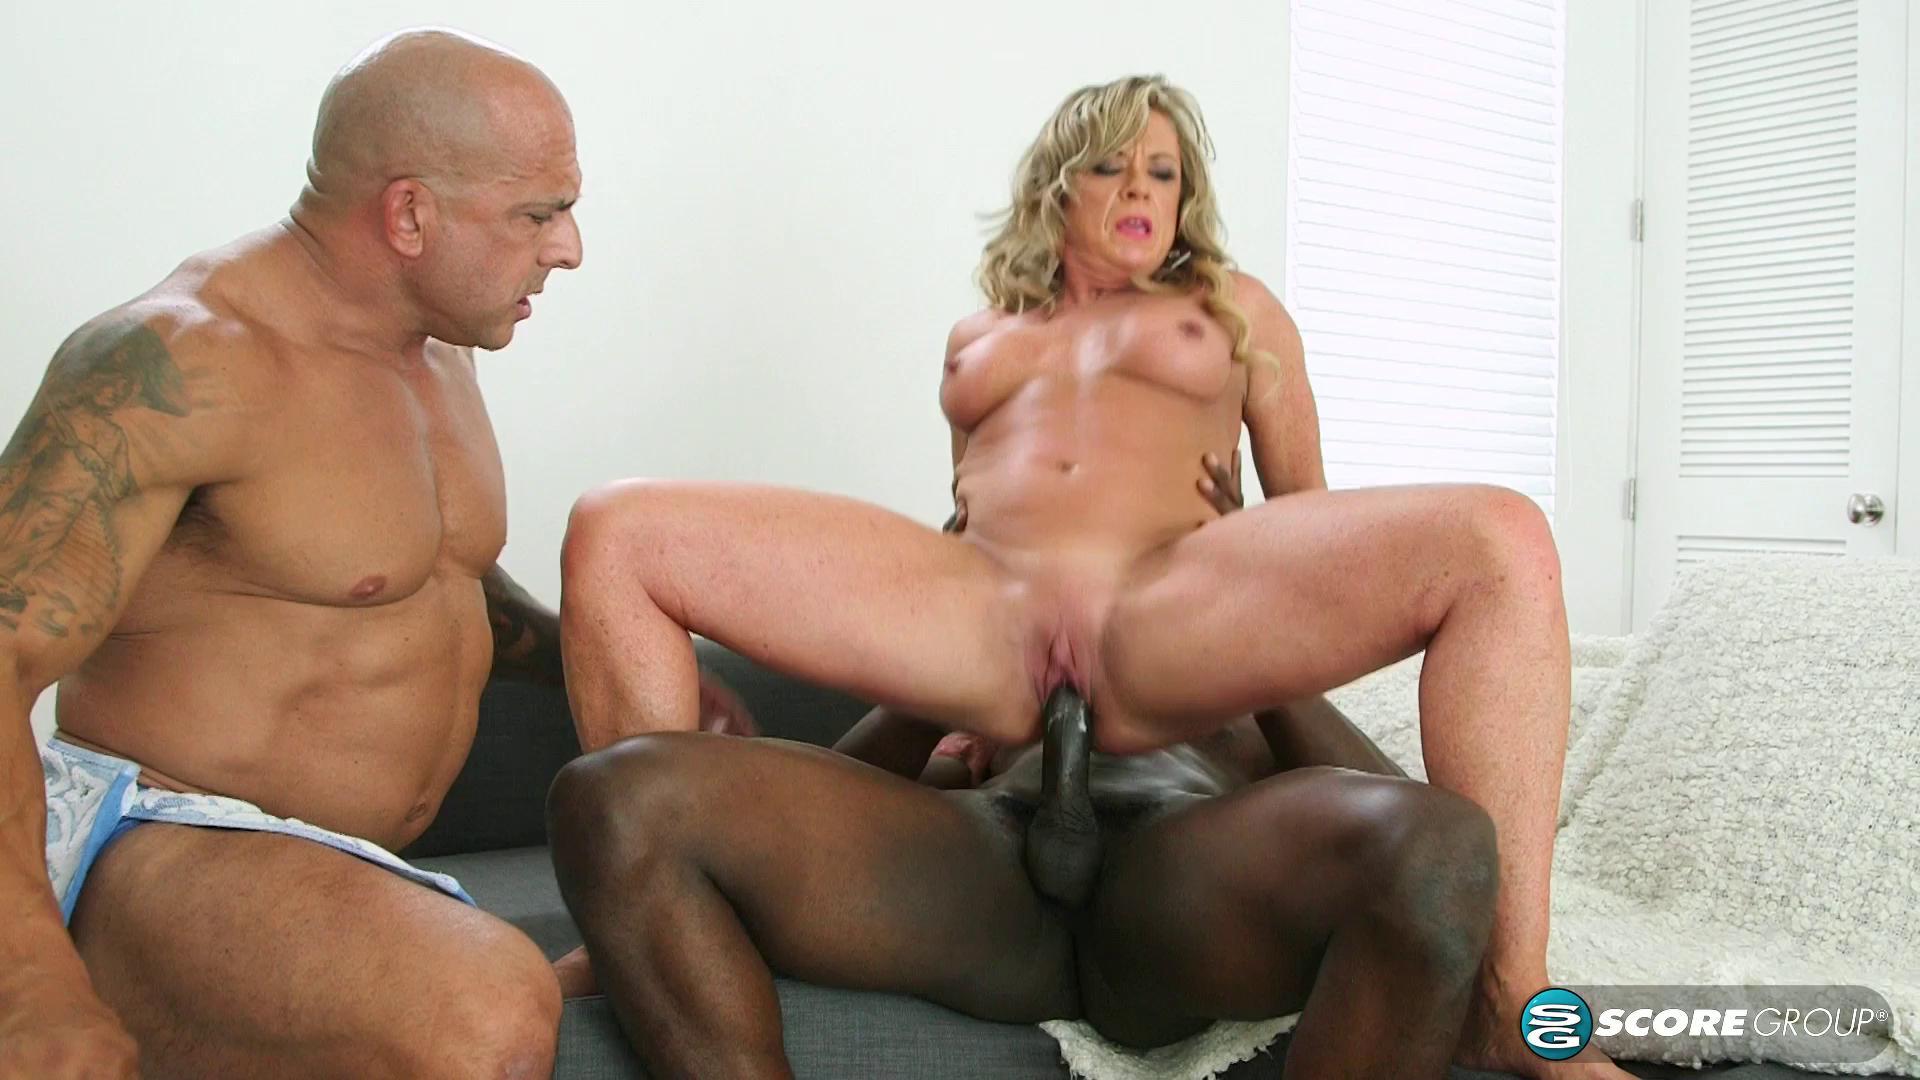 PornMegaLoad – Missy Blewitt BBC Anal Cuckold